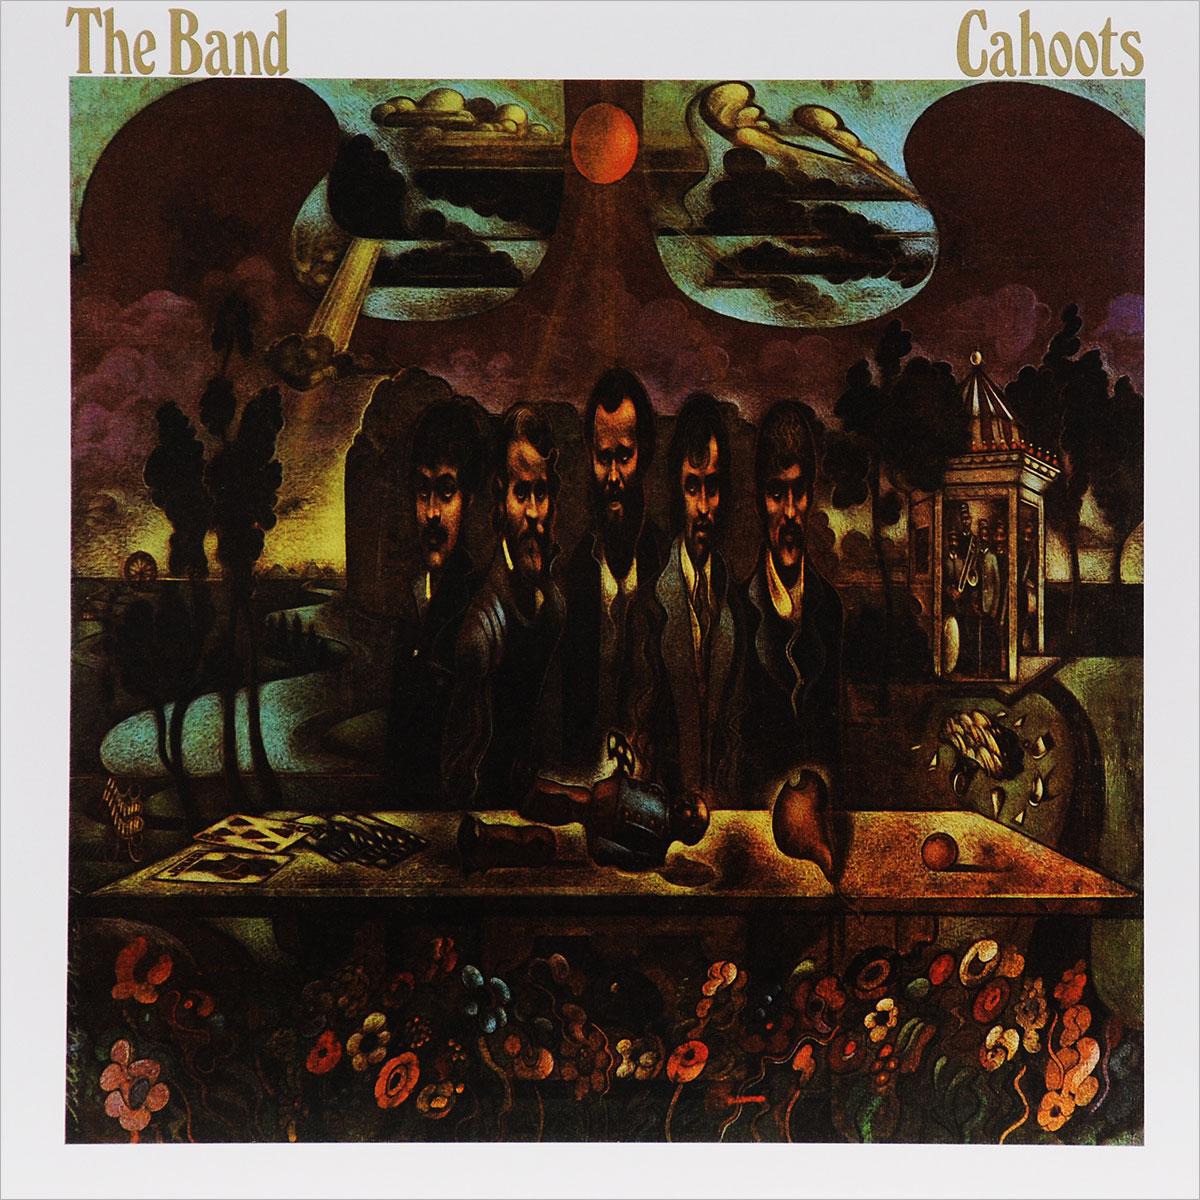 The Band The Band. Cahoots (LP) the band the band cahoots lp